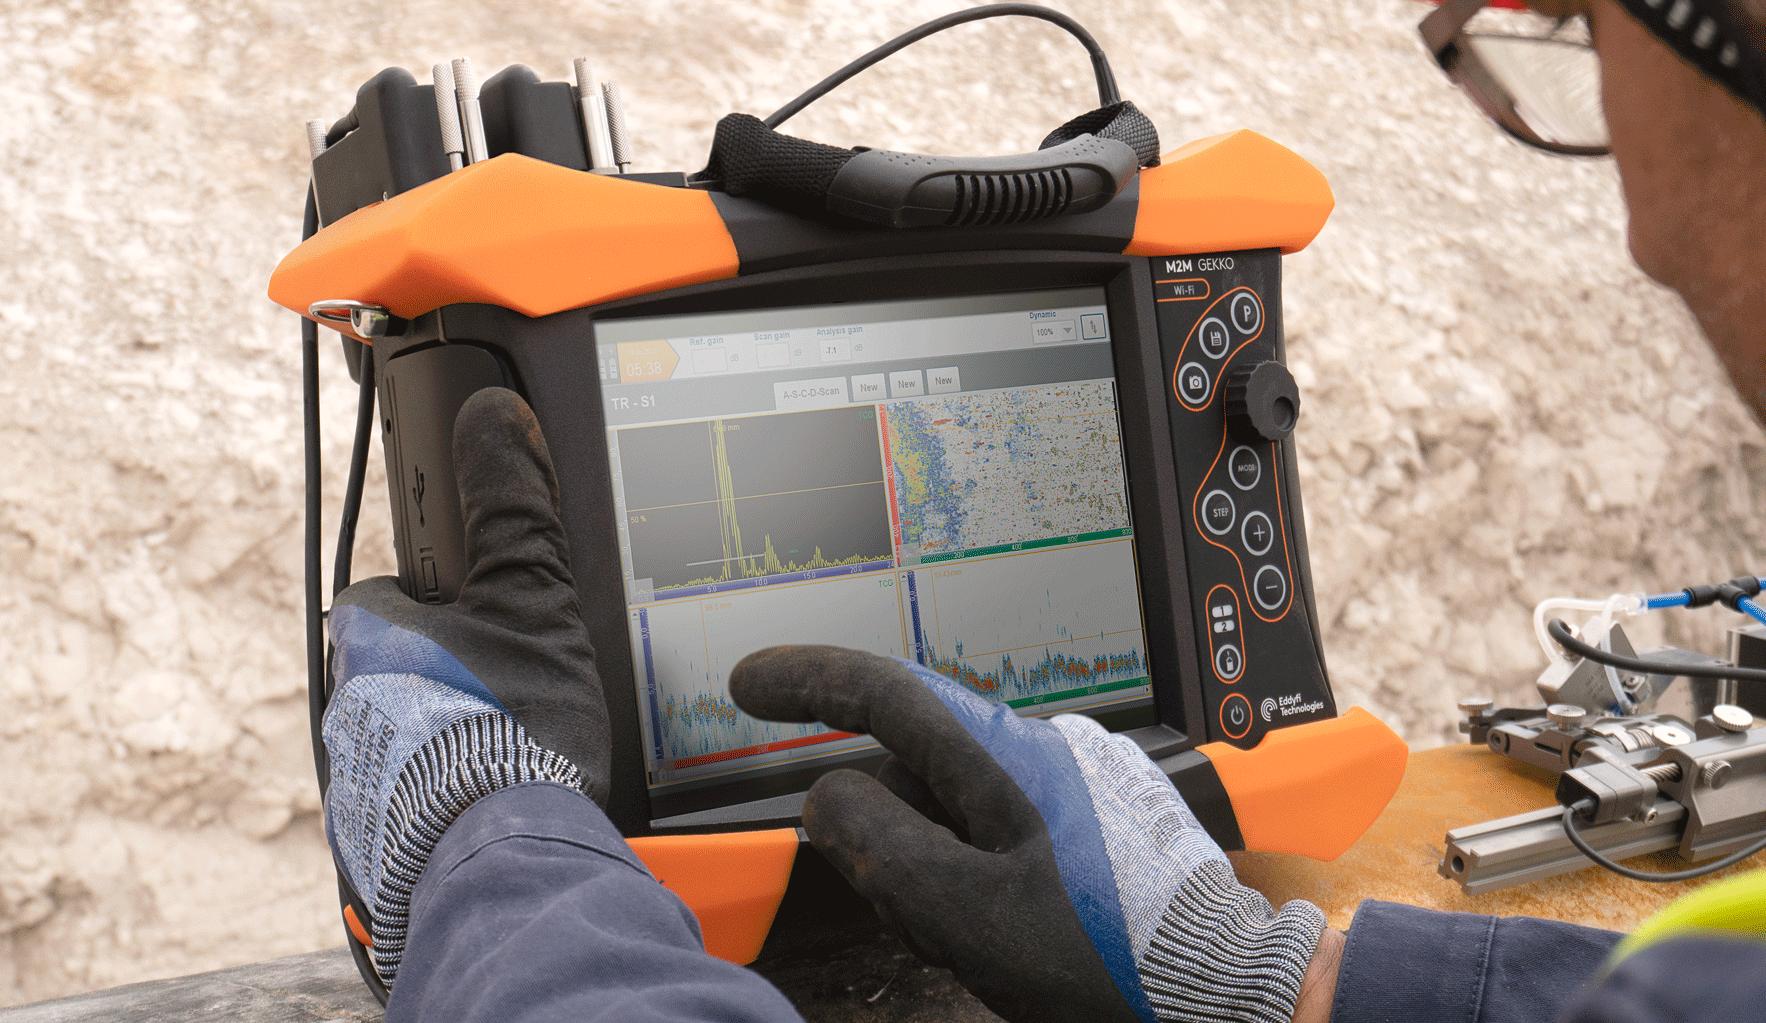 M2M Gekko Weld Inspection Capture Software Analysis thumb-1